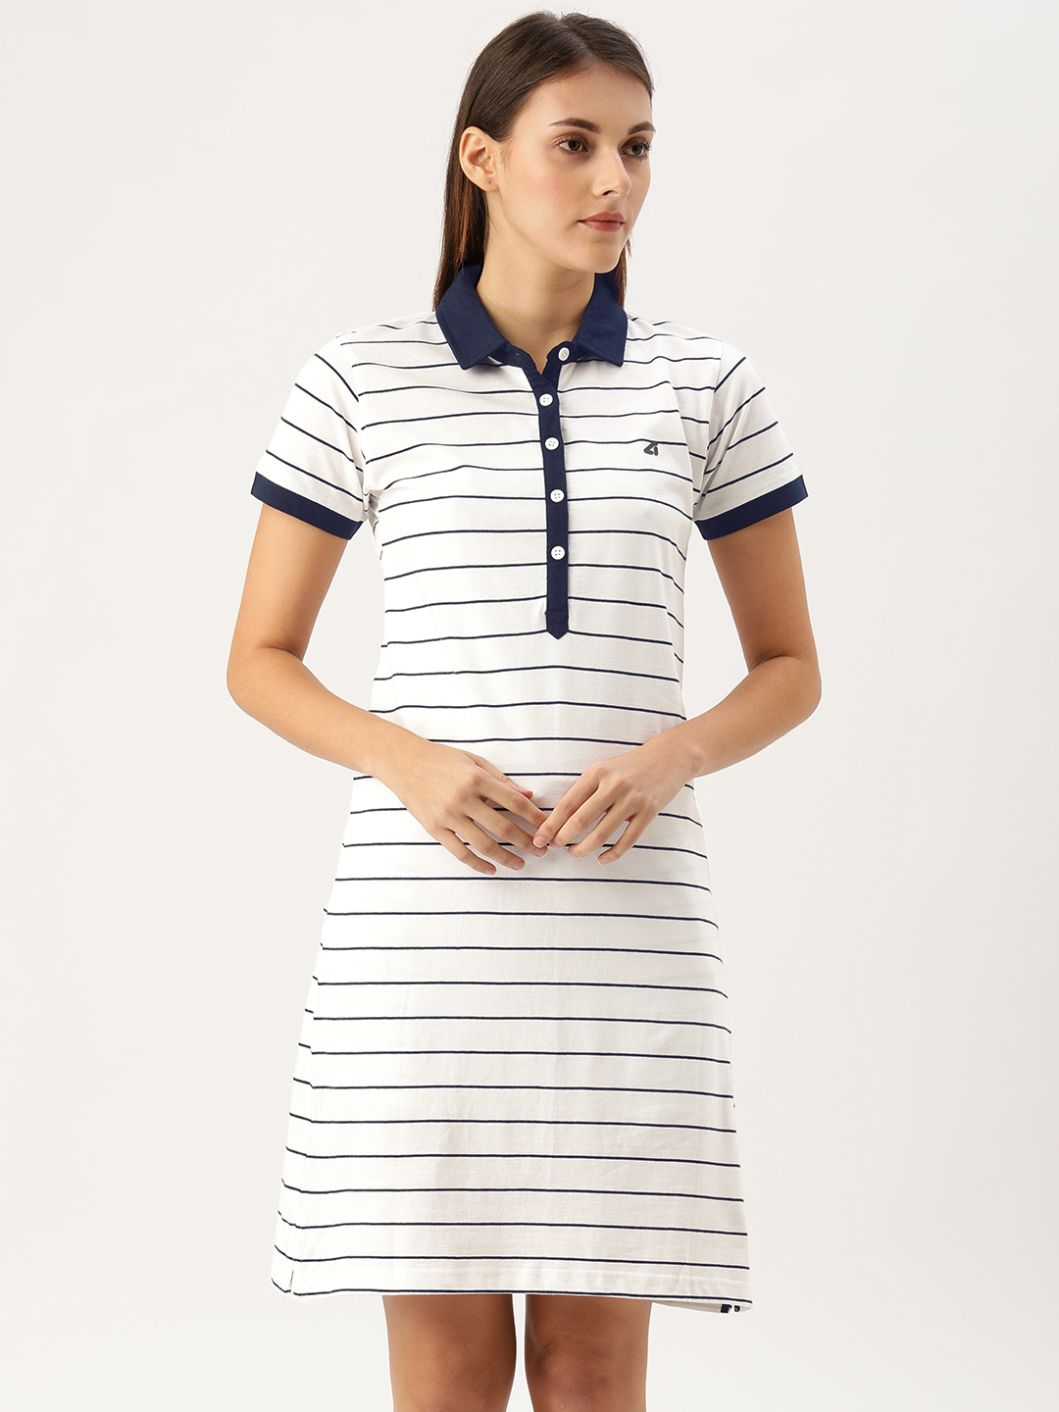 Mariner White / Navy Polo Dress